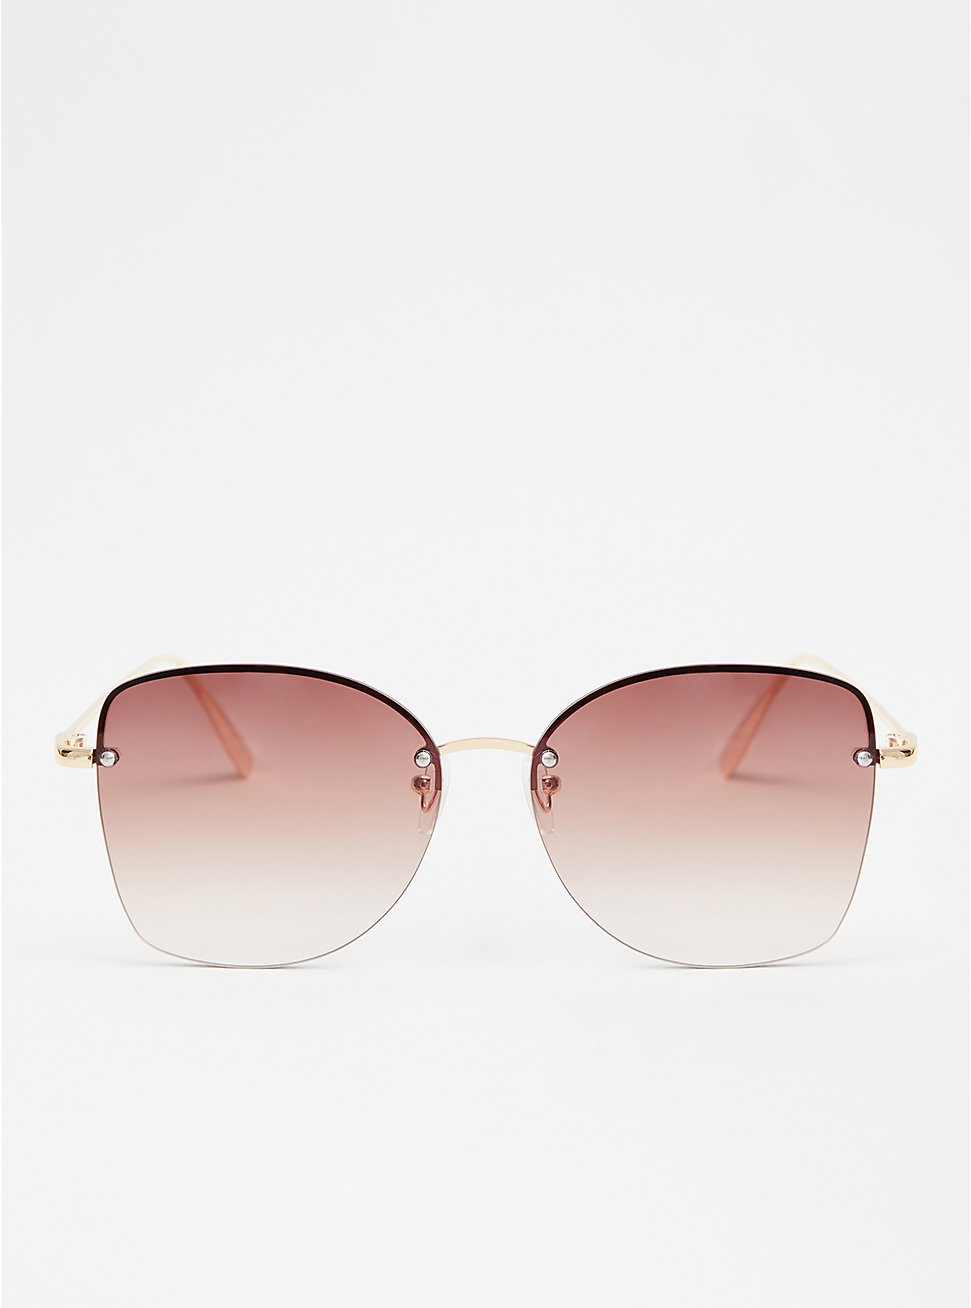 Brown Rimless Square Sunglasses, , hi-res